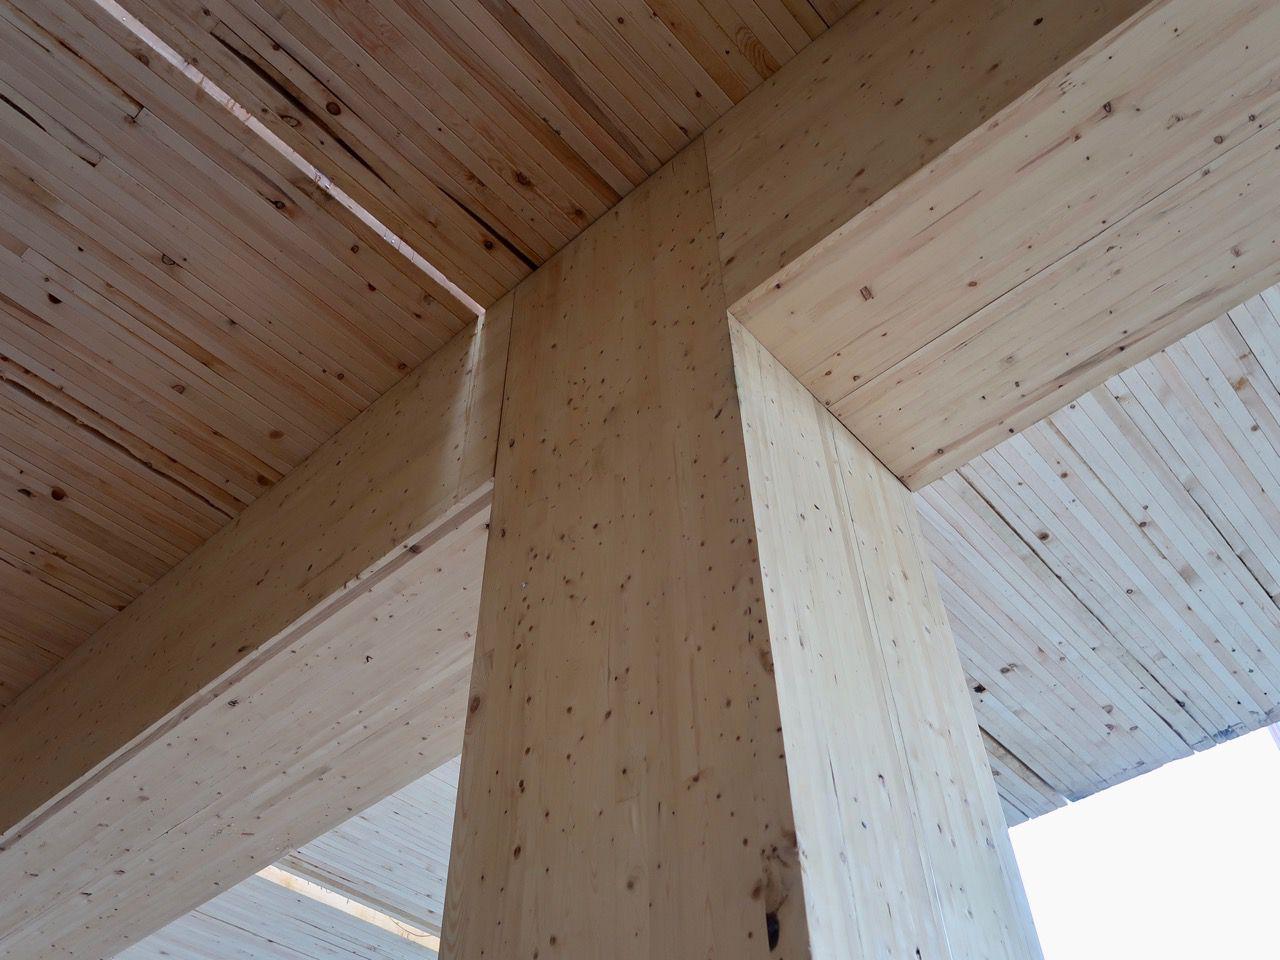 Column and beam